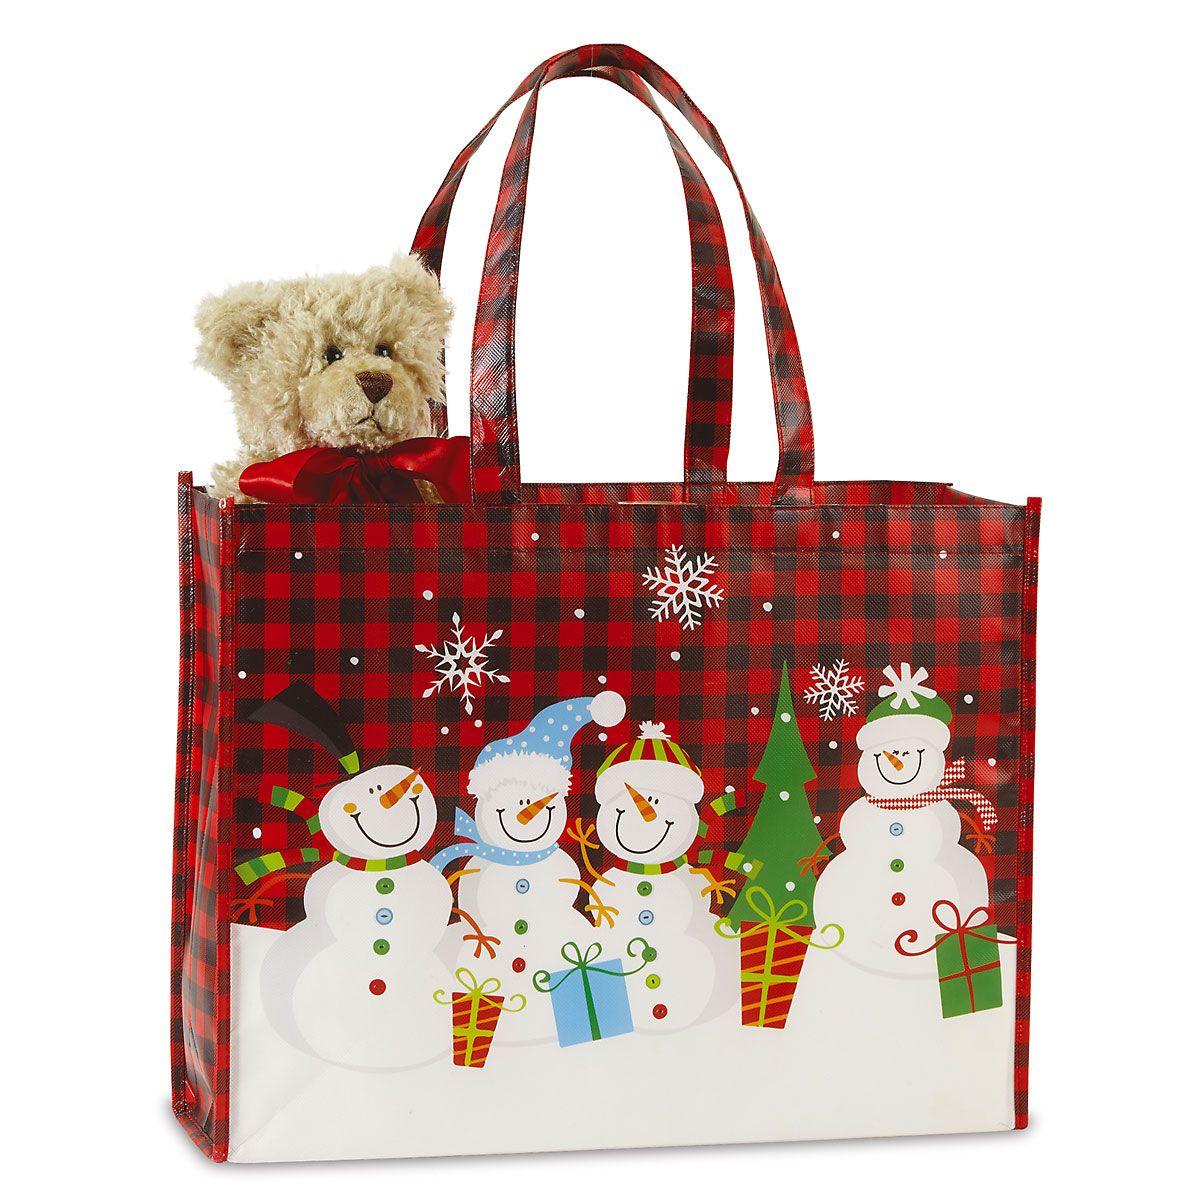 Snowman Plaid Shopping Tote - BOGO